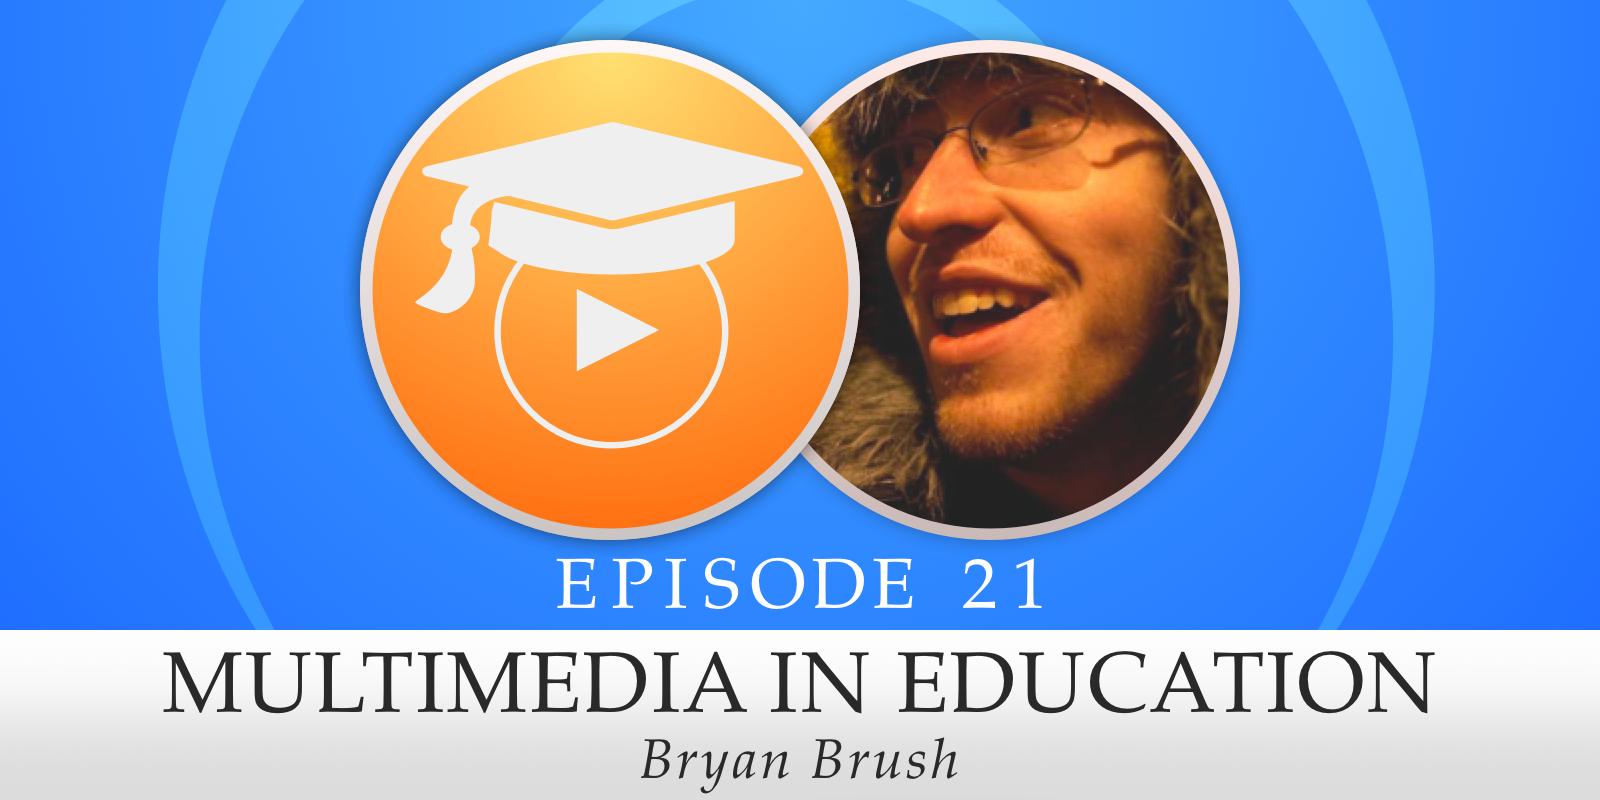 Episode 21: Multimedia in Education